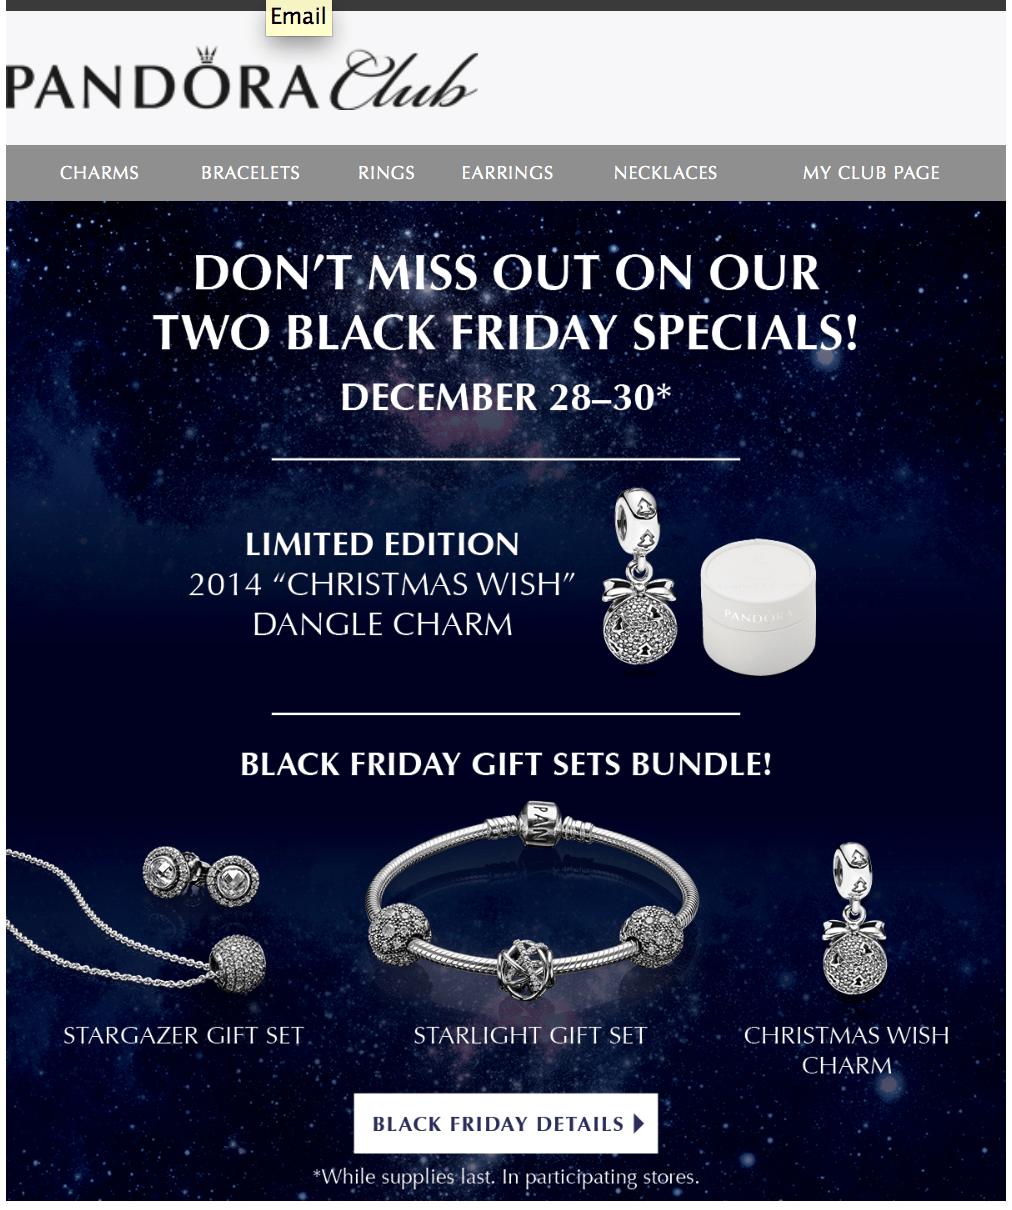 Pandora Black Friday 2017 Sale & Holiday Charms | Cyber Week 2017 ...